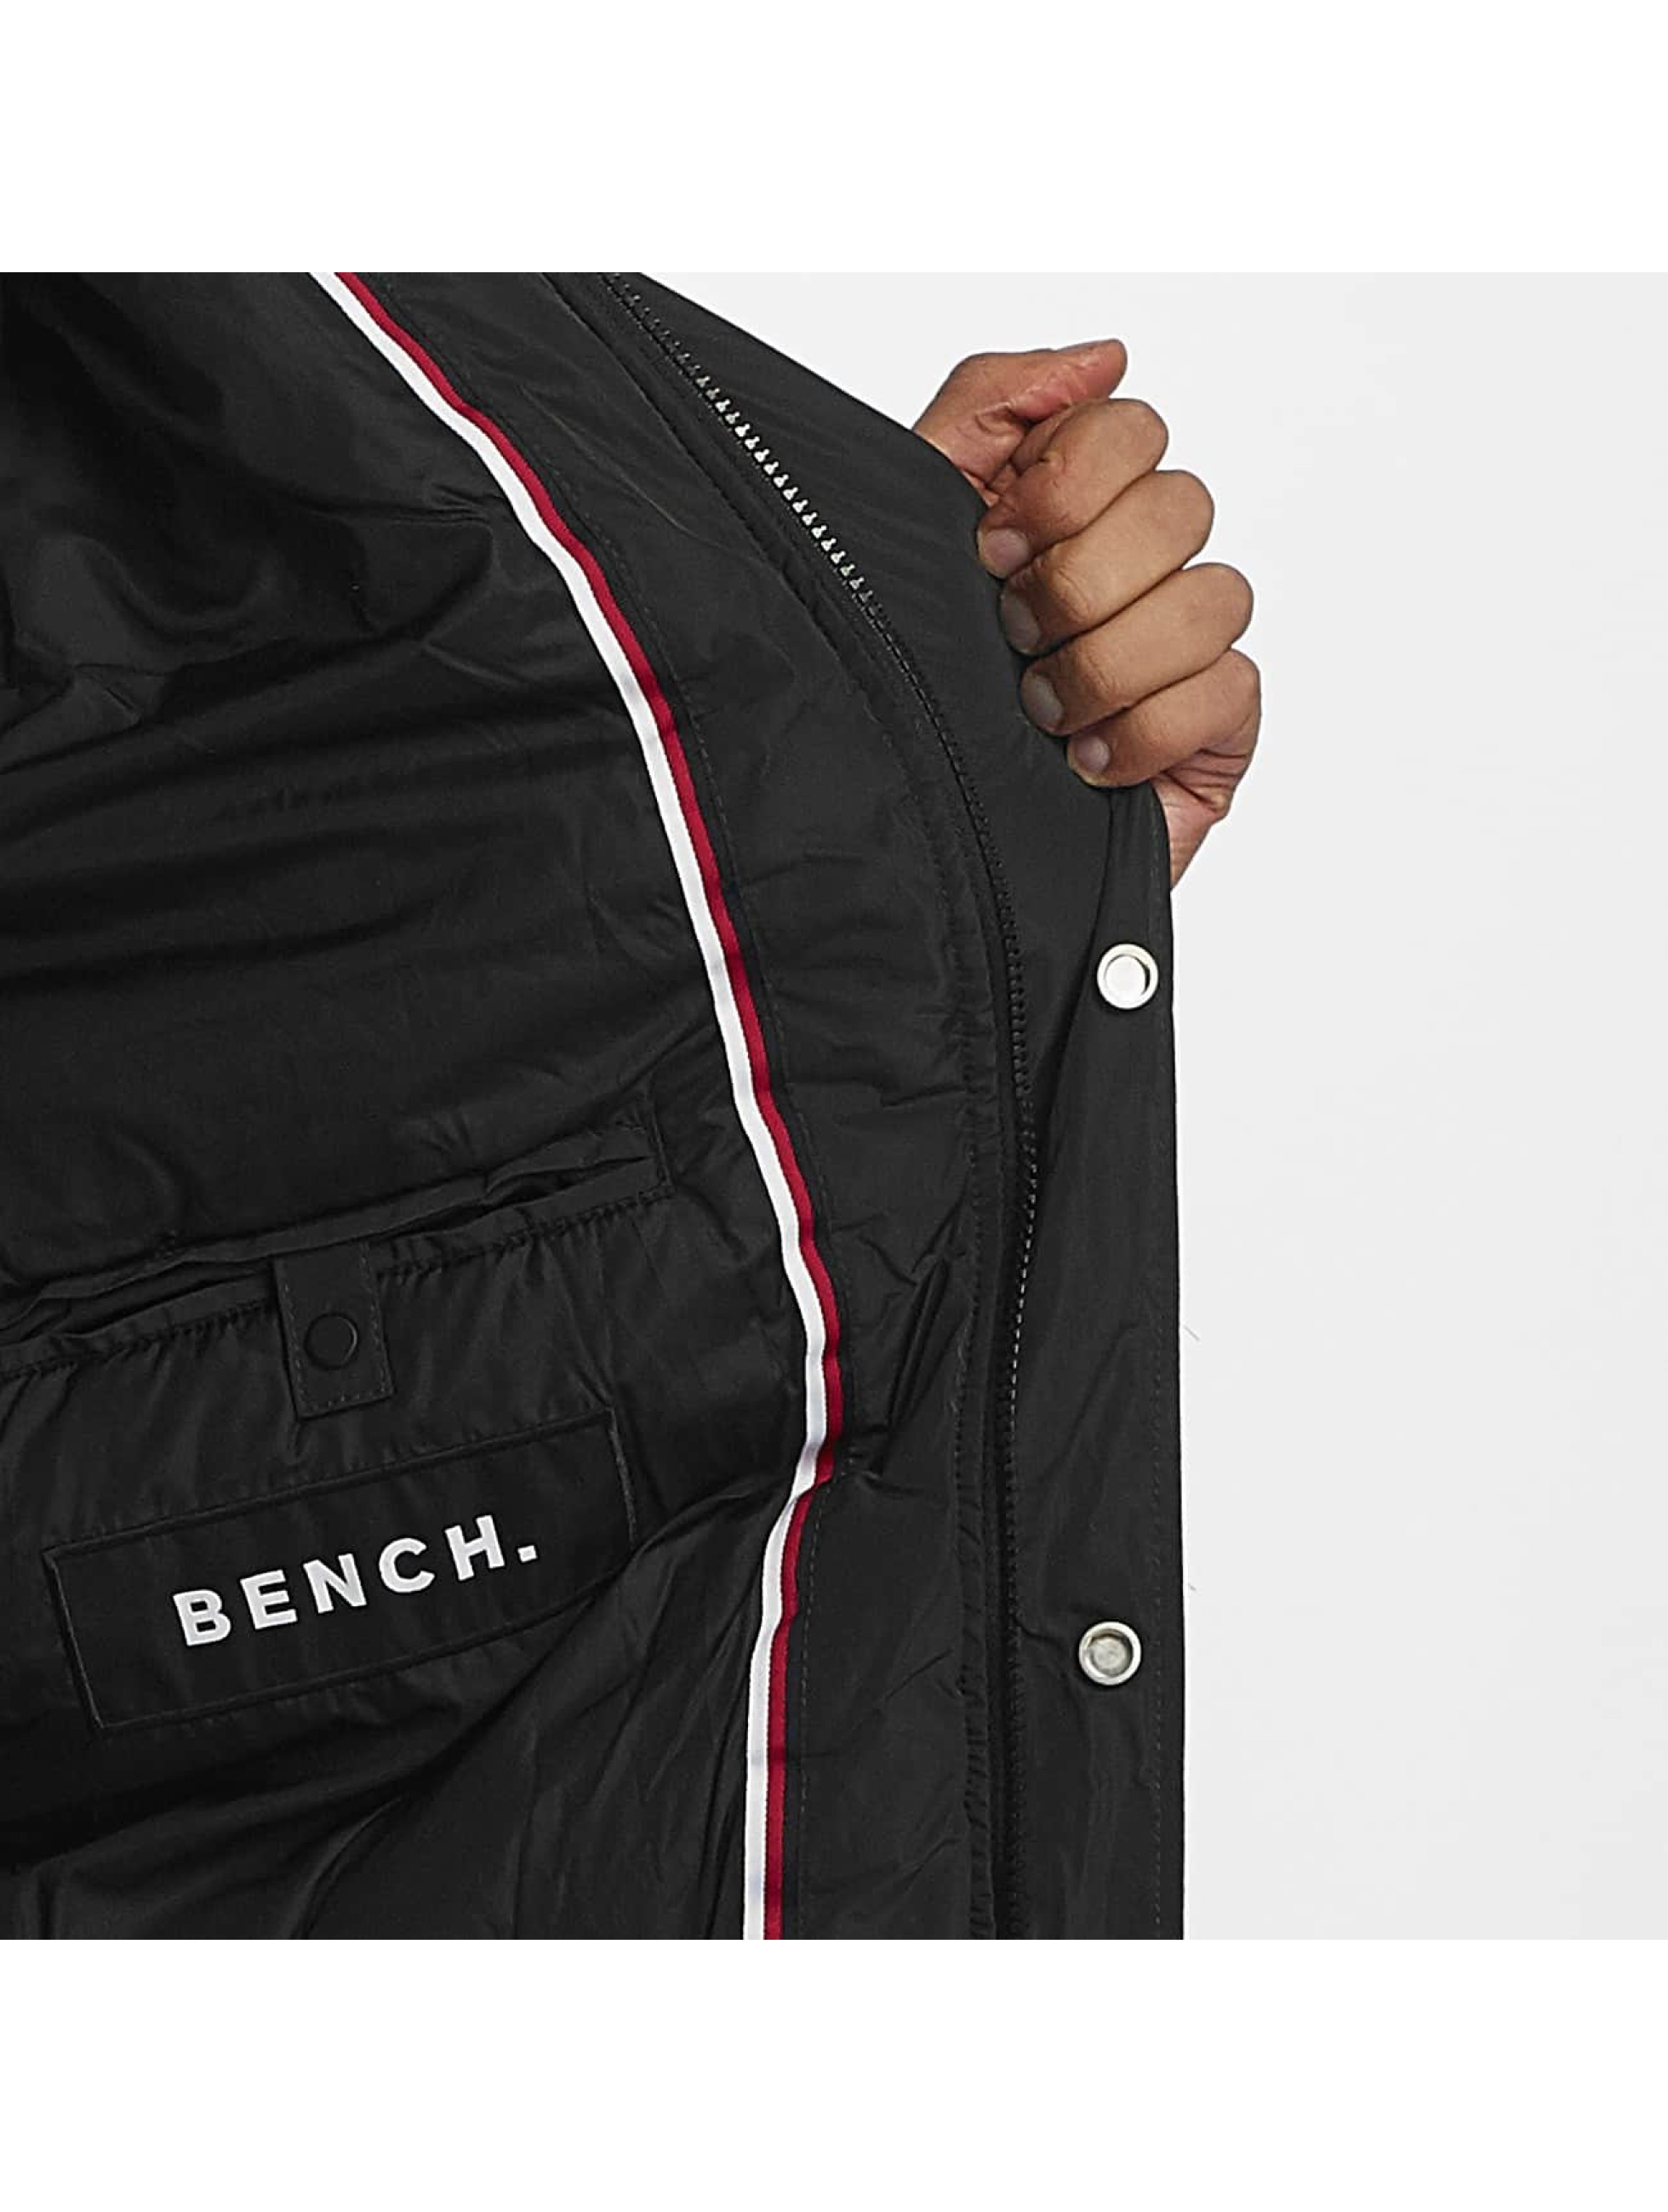 Bench Winter Jacket Nomens gray